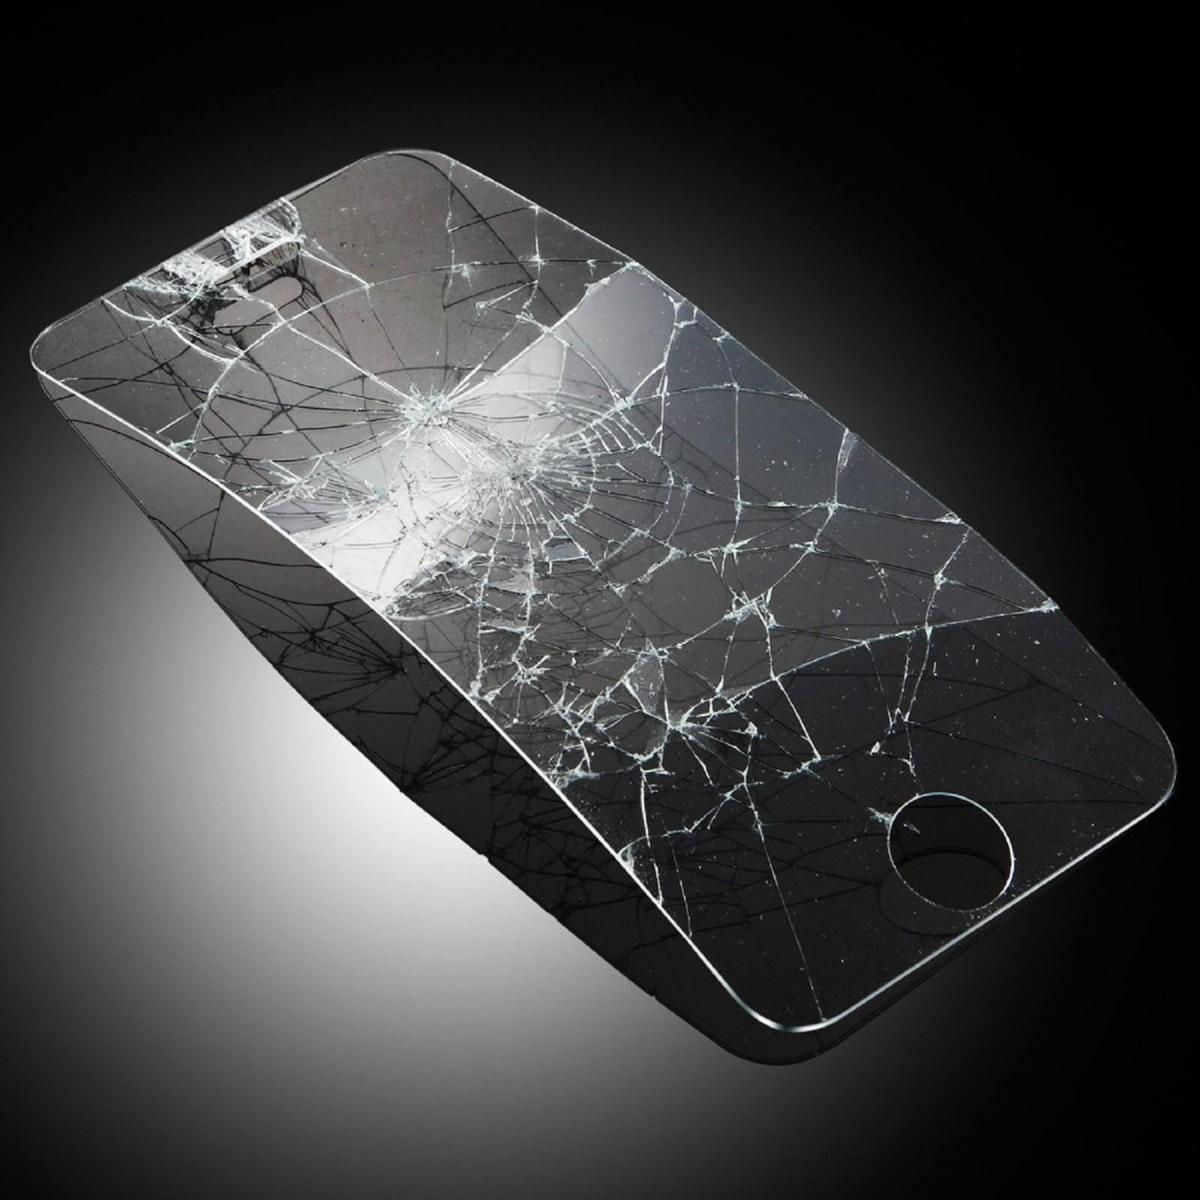 Kit-Protector-de-Pantalla-Cristal-Templado-Vidrio-para-Huawei-P-Smart-2019 miniatura 3